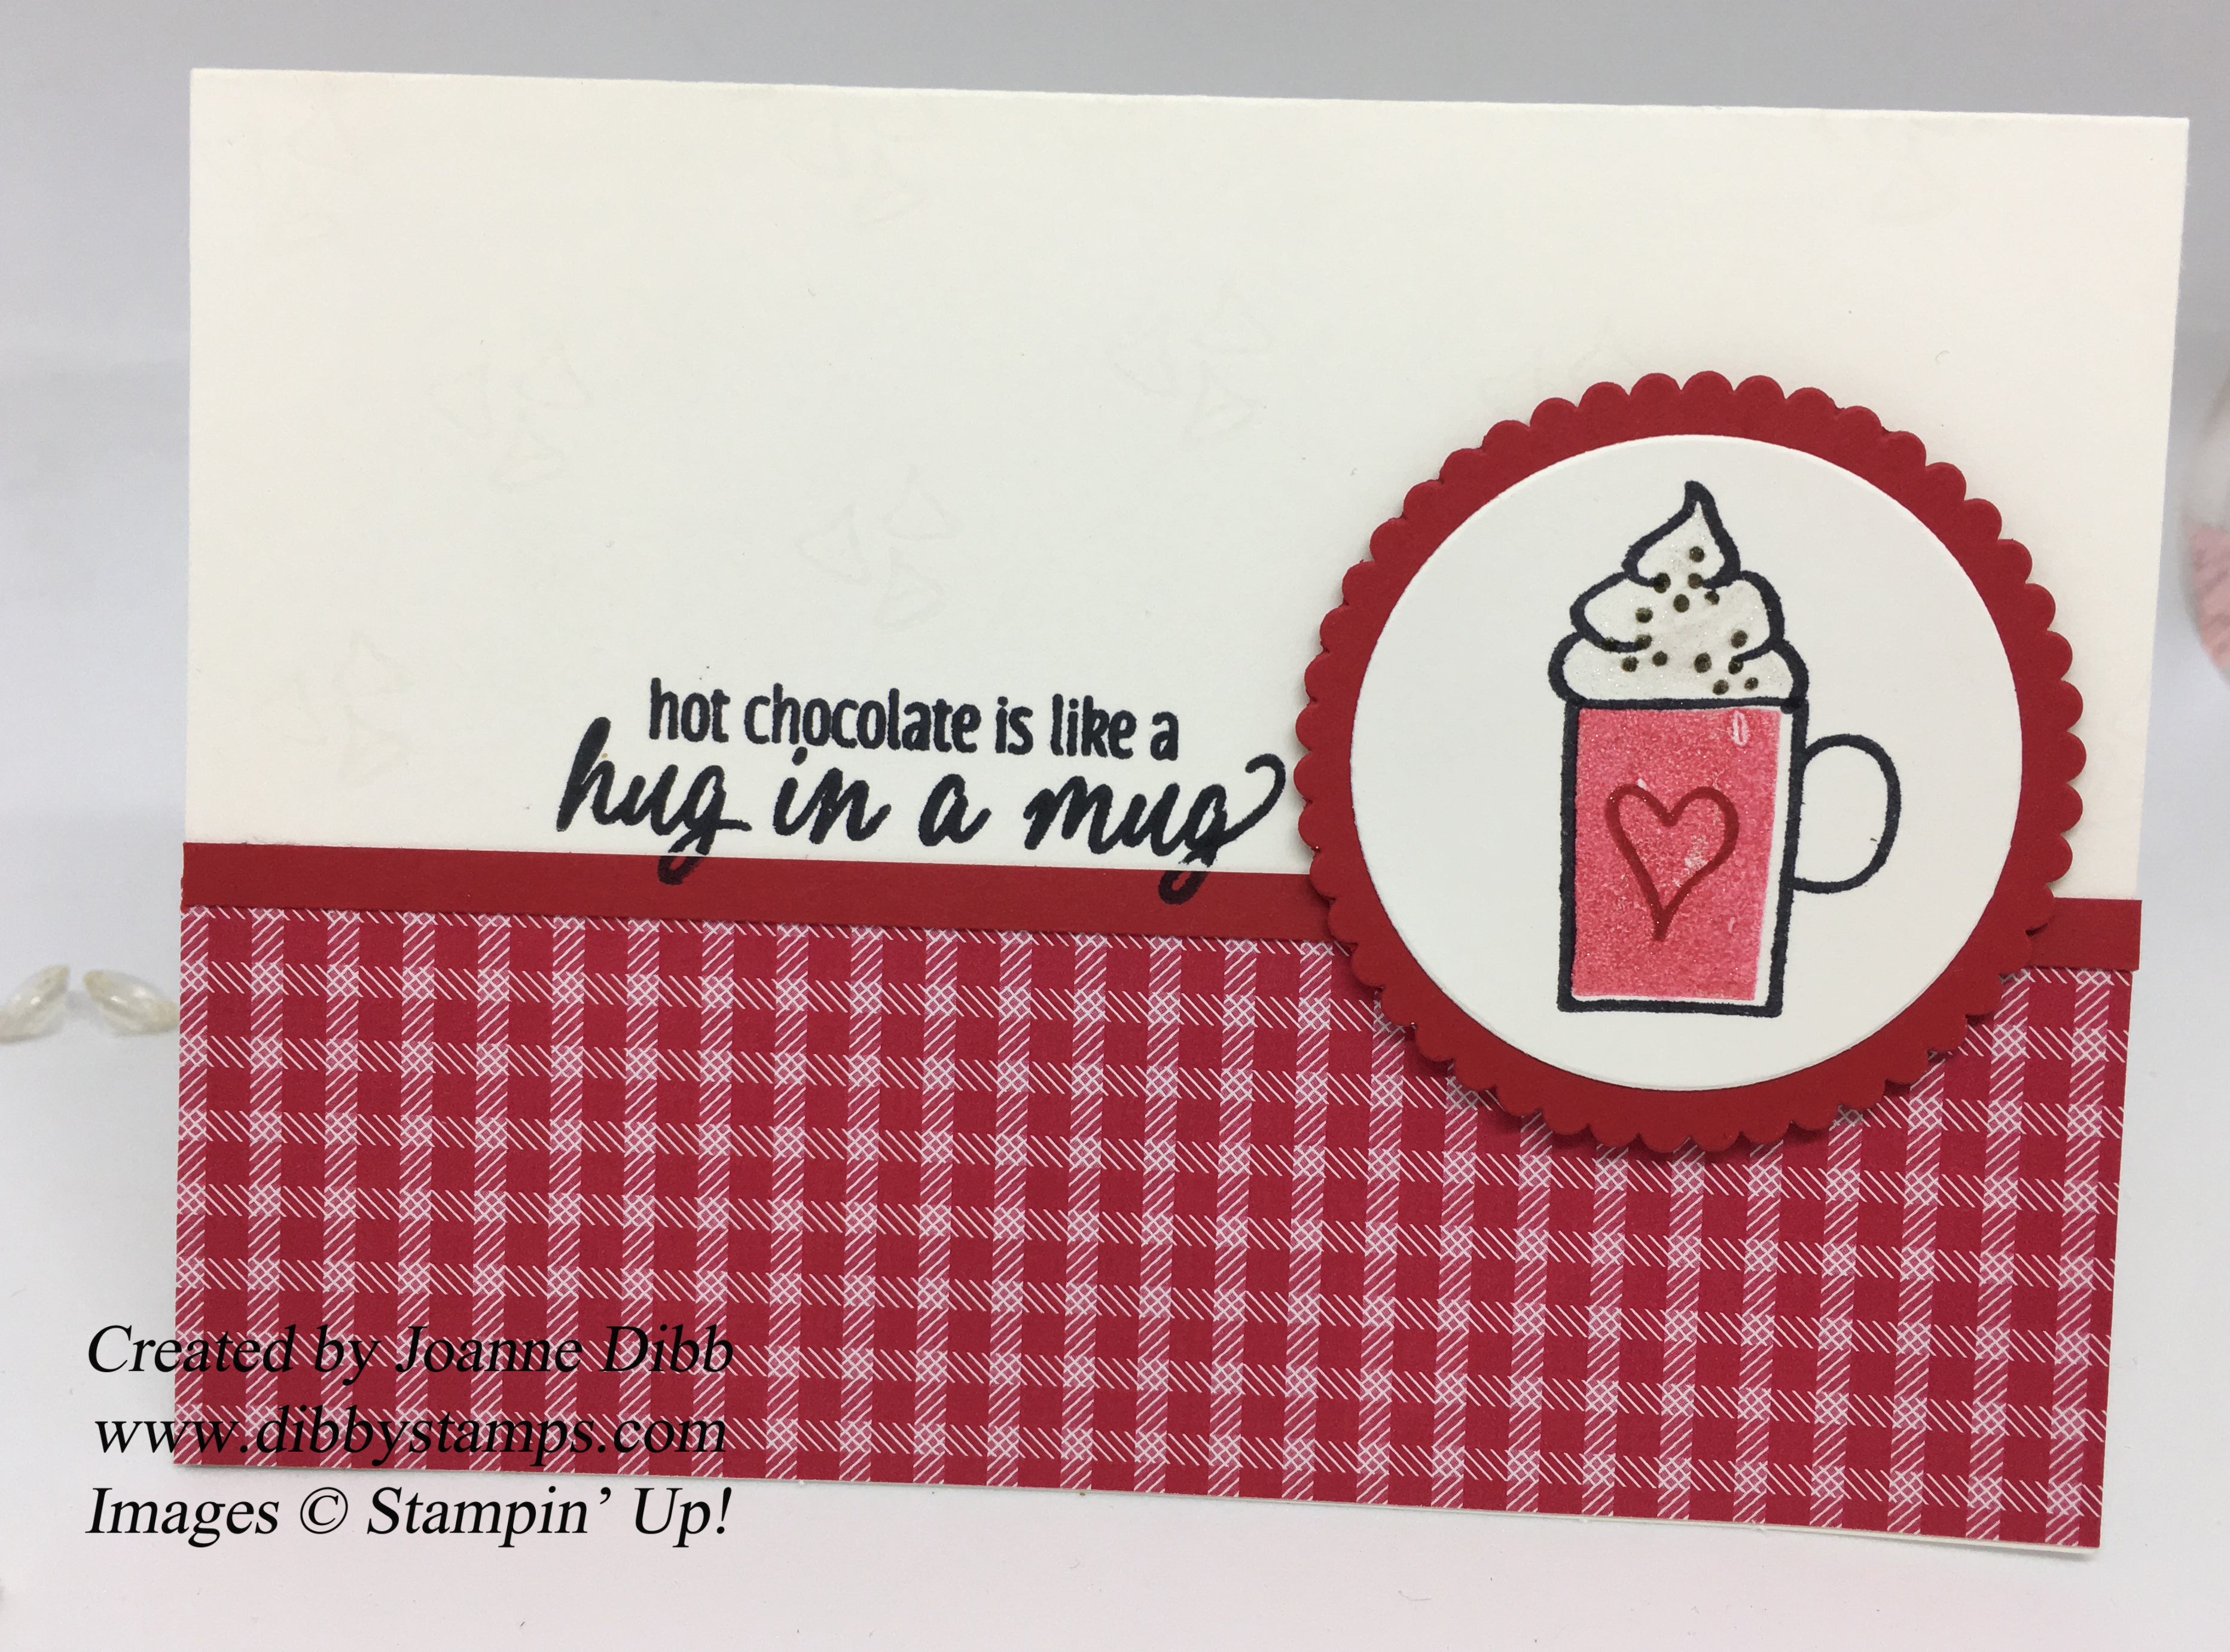 hotchocolate card